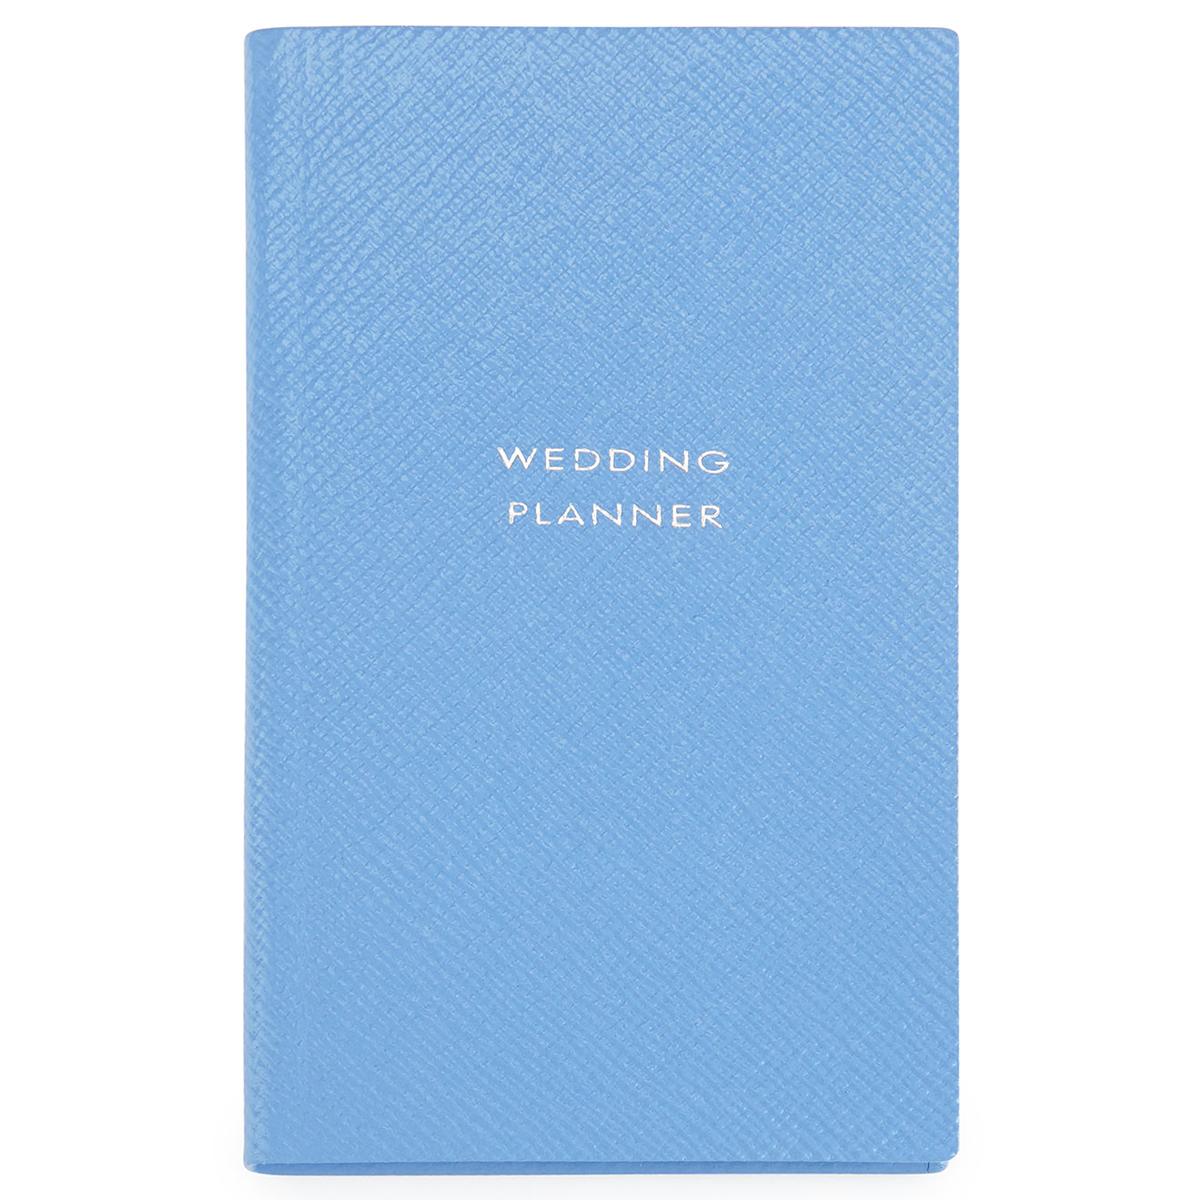 smythson-wedding-planner-panama-notebook